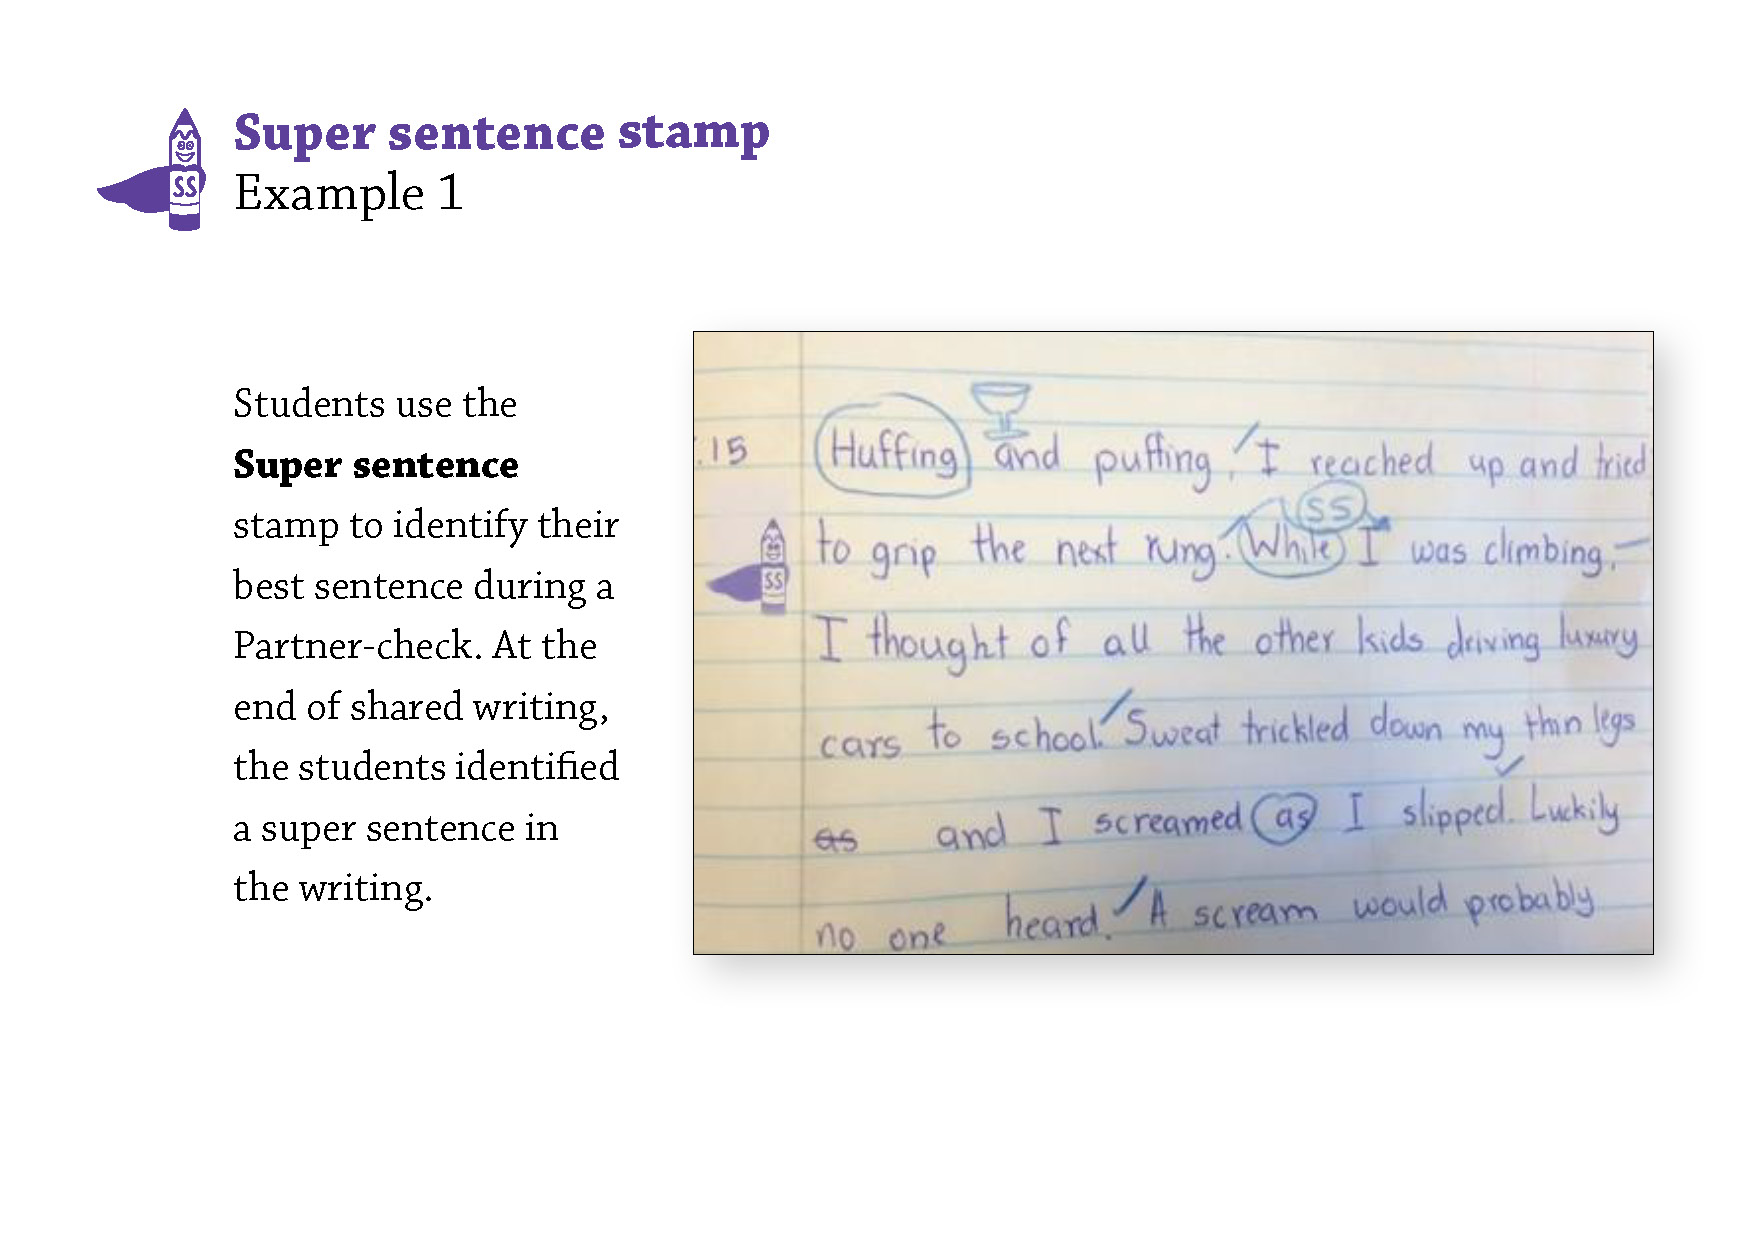 Super sentence 1